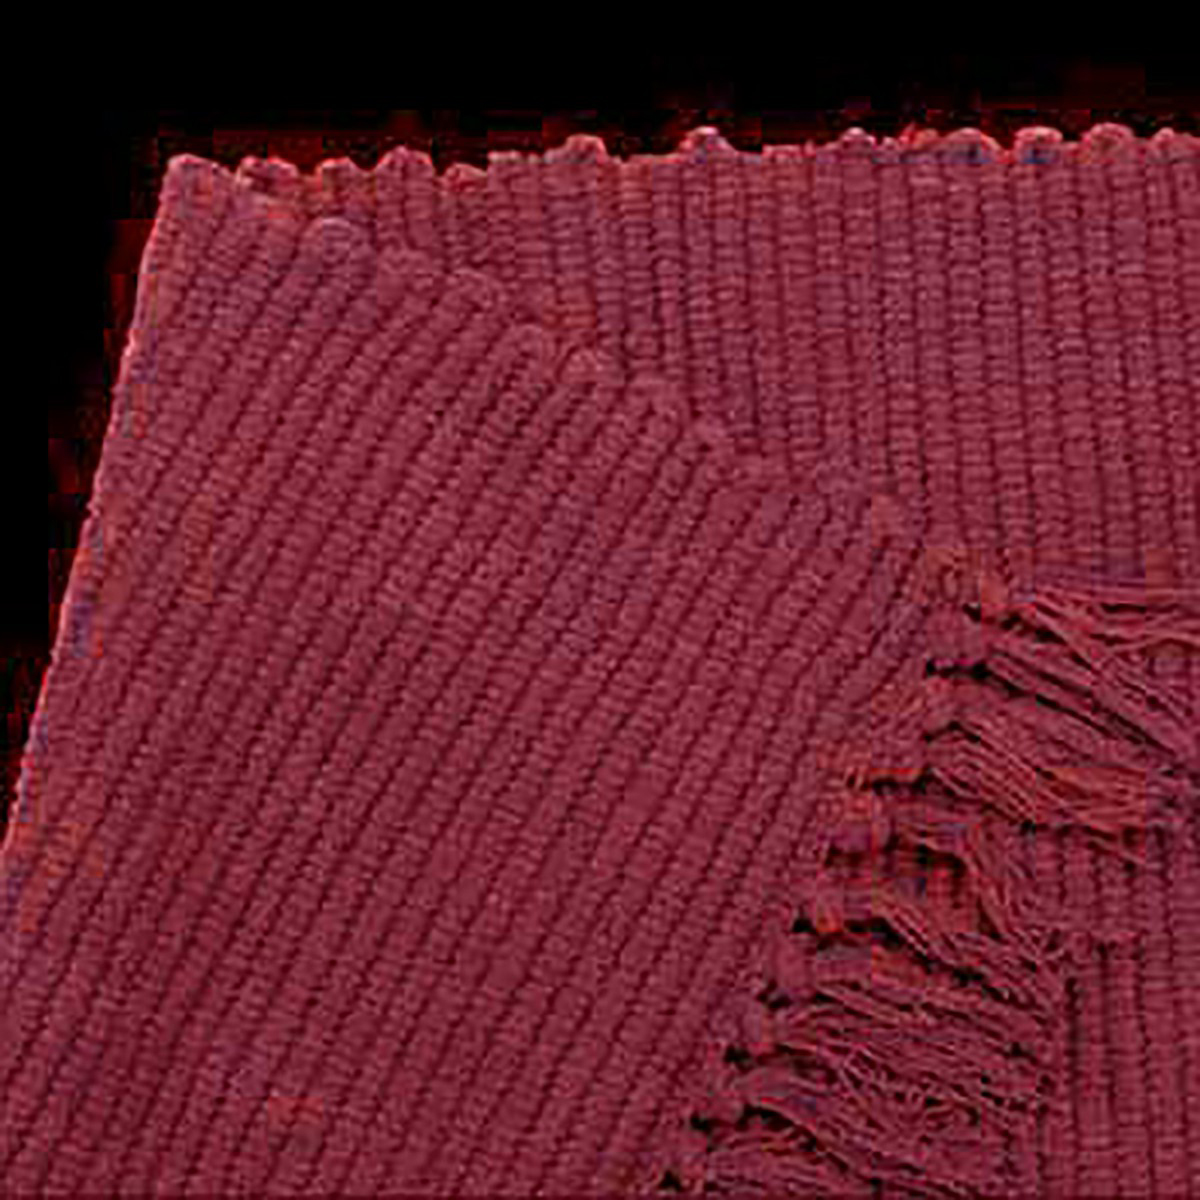 Rectangular Area Rug 8 x 2 6 Red Cotton Carpet Runner Carpet Runners Stairs Runner